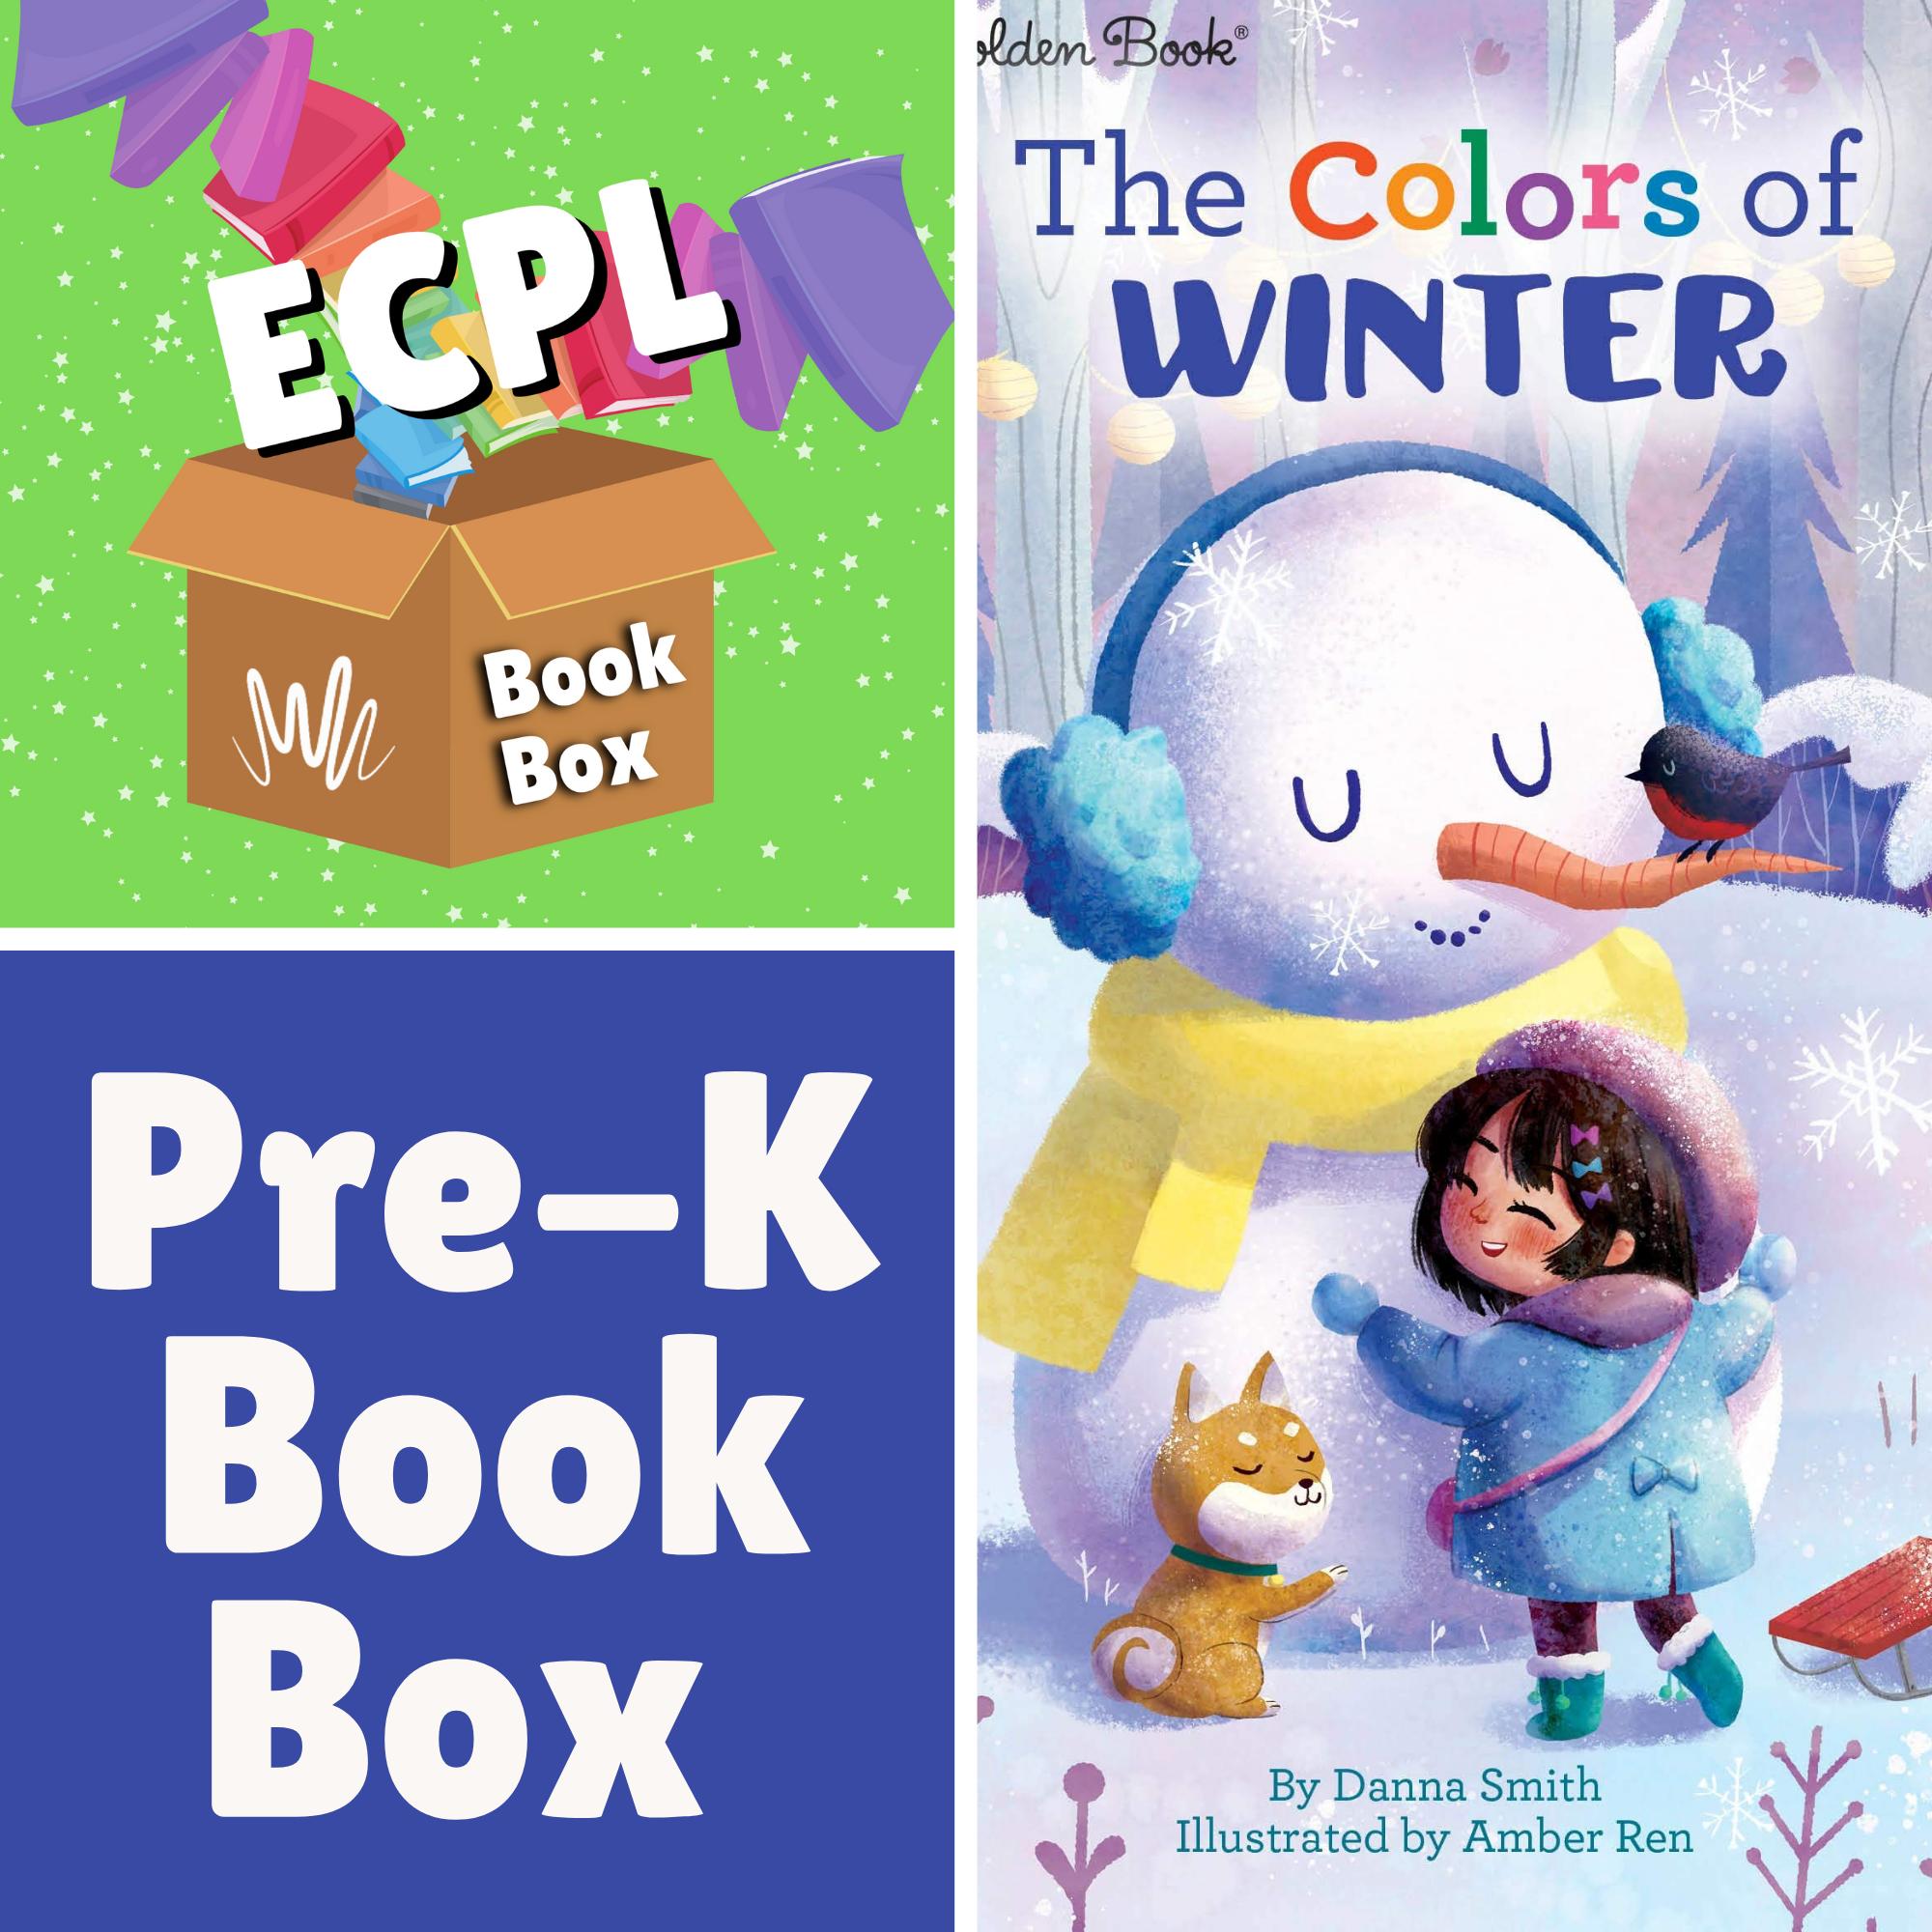 Preschool Book Box - The Colors of Winter